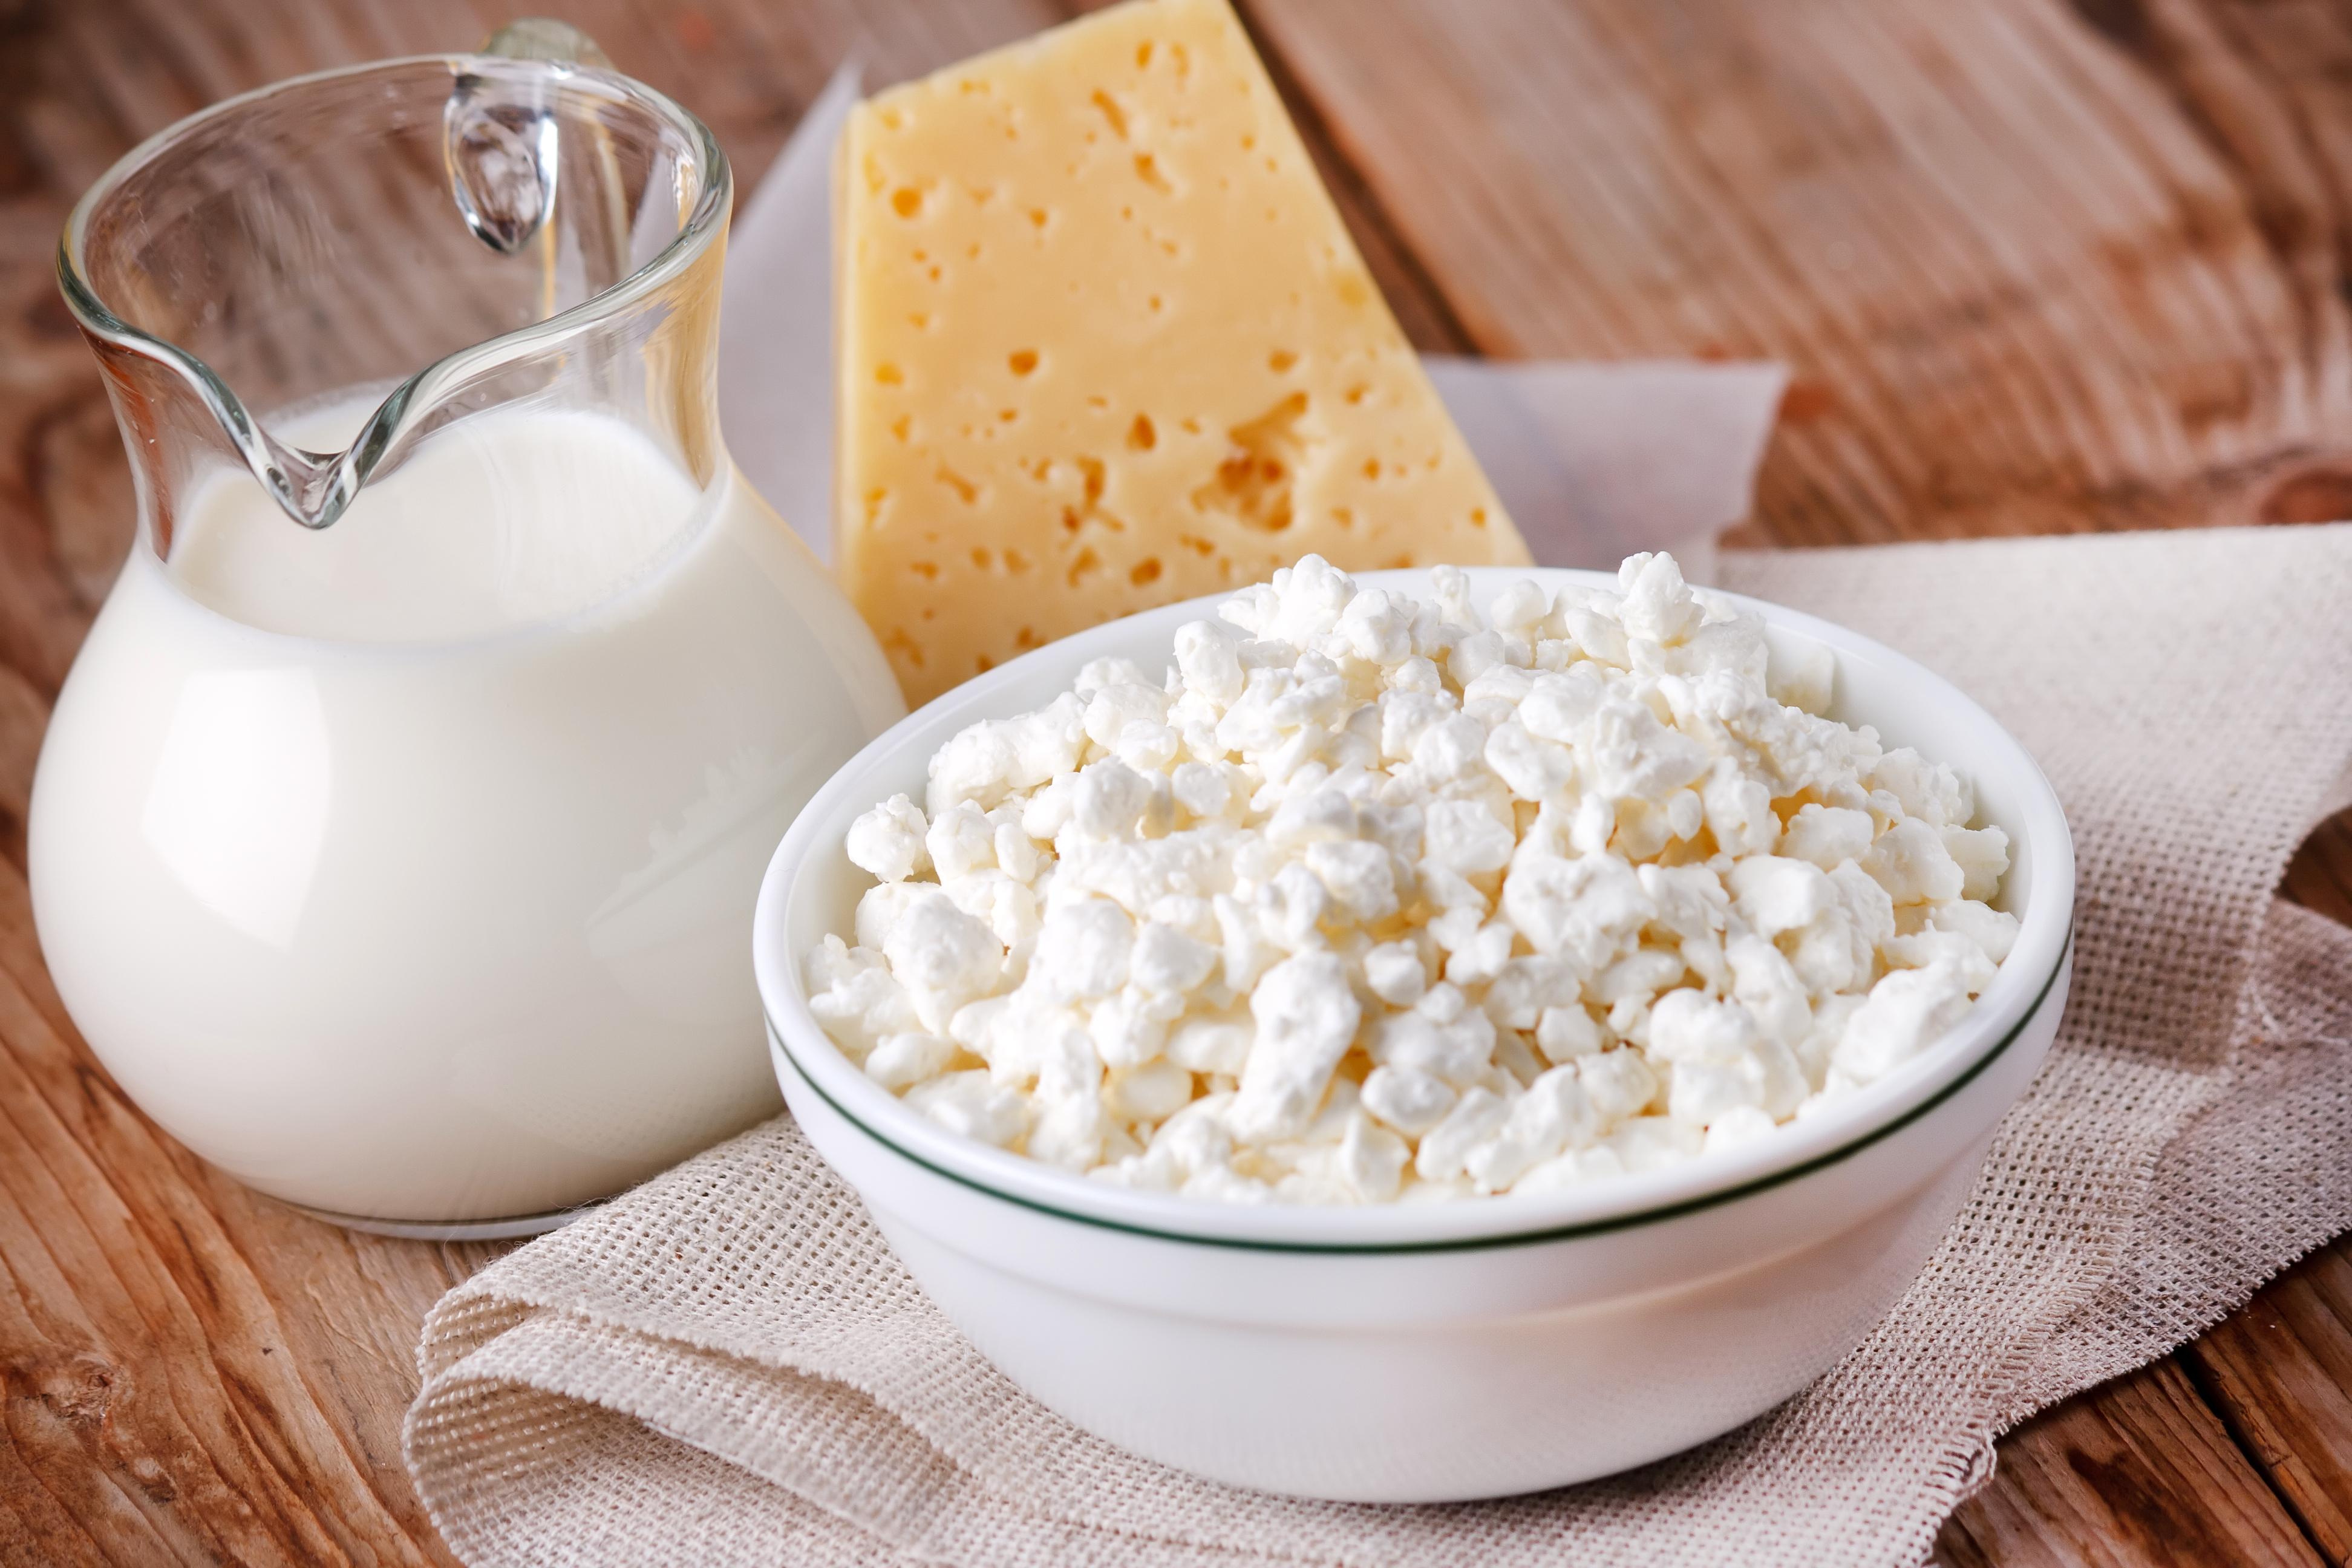 Сыр свежий творог белом фоне коза творога синий салфетку молочных.